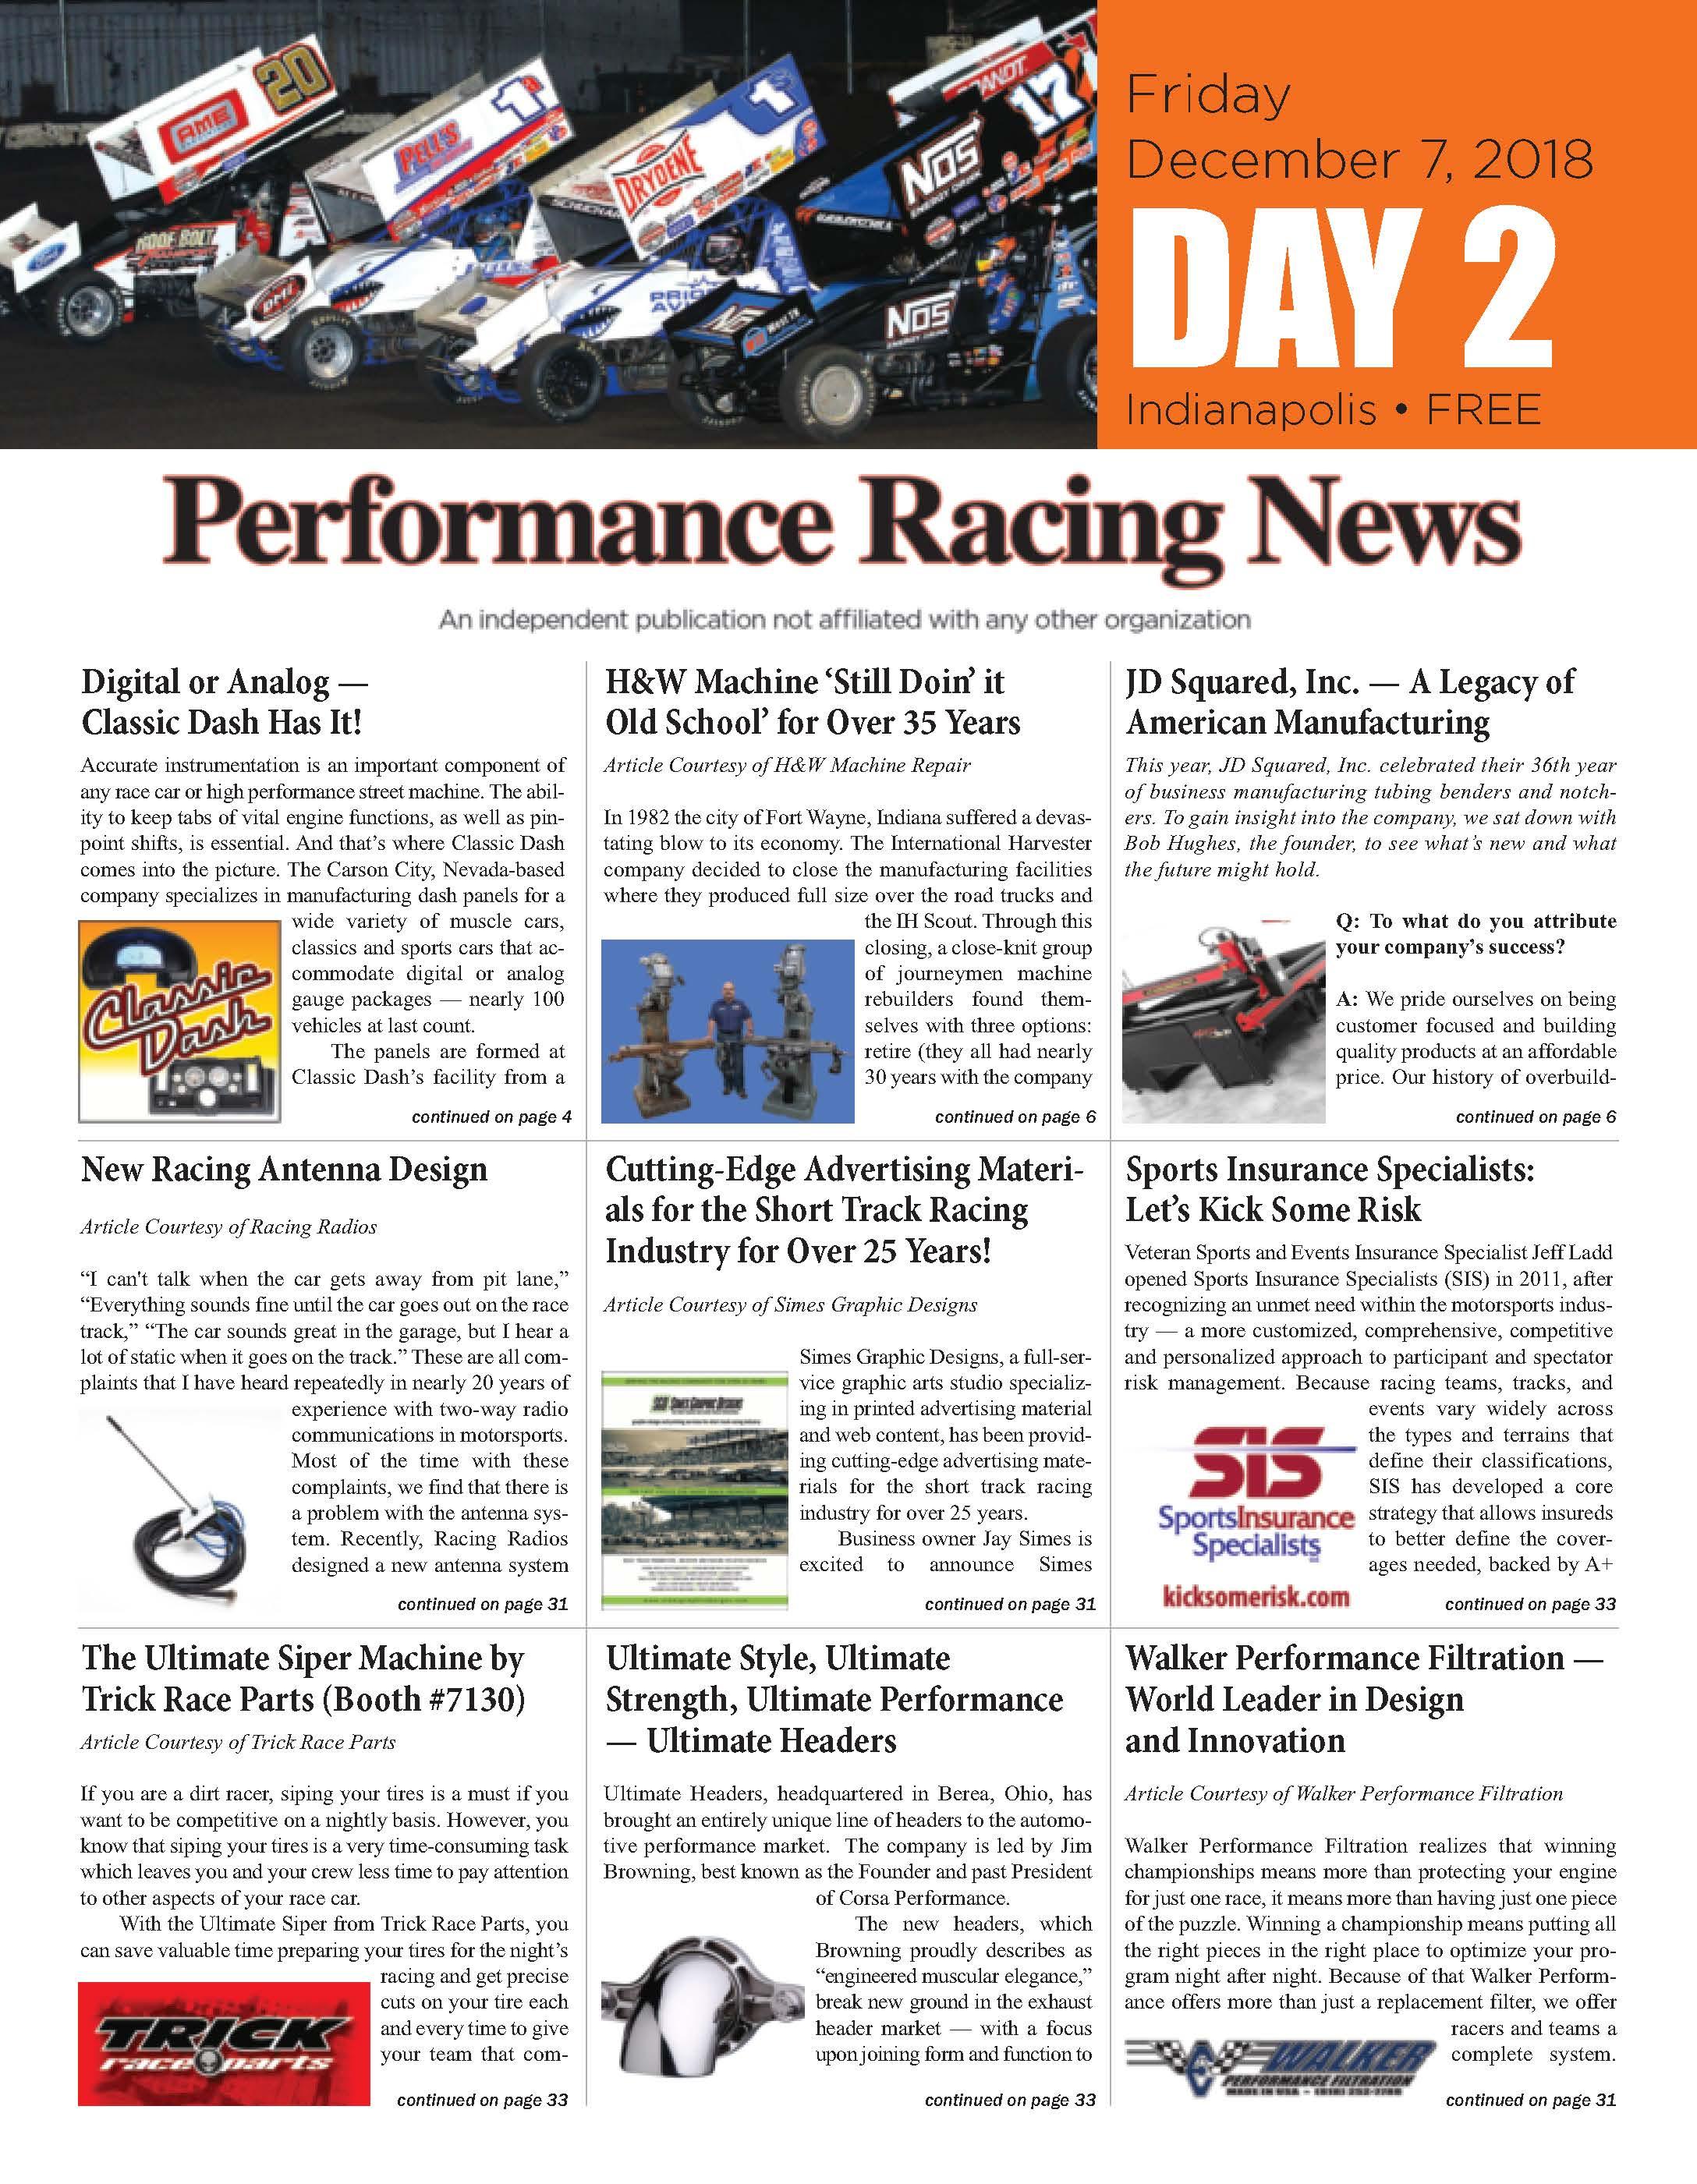 Performance Industry News